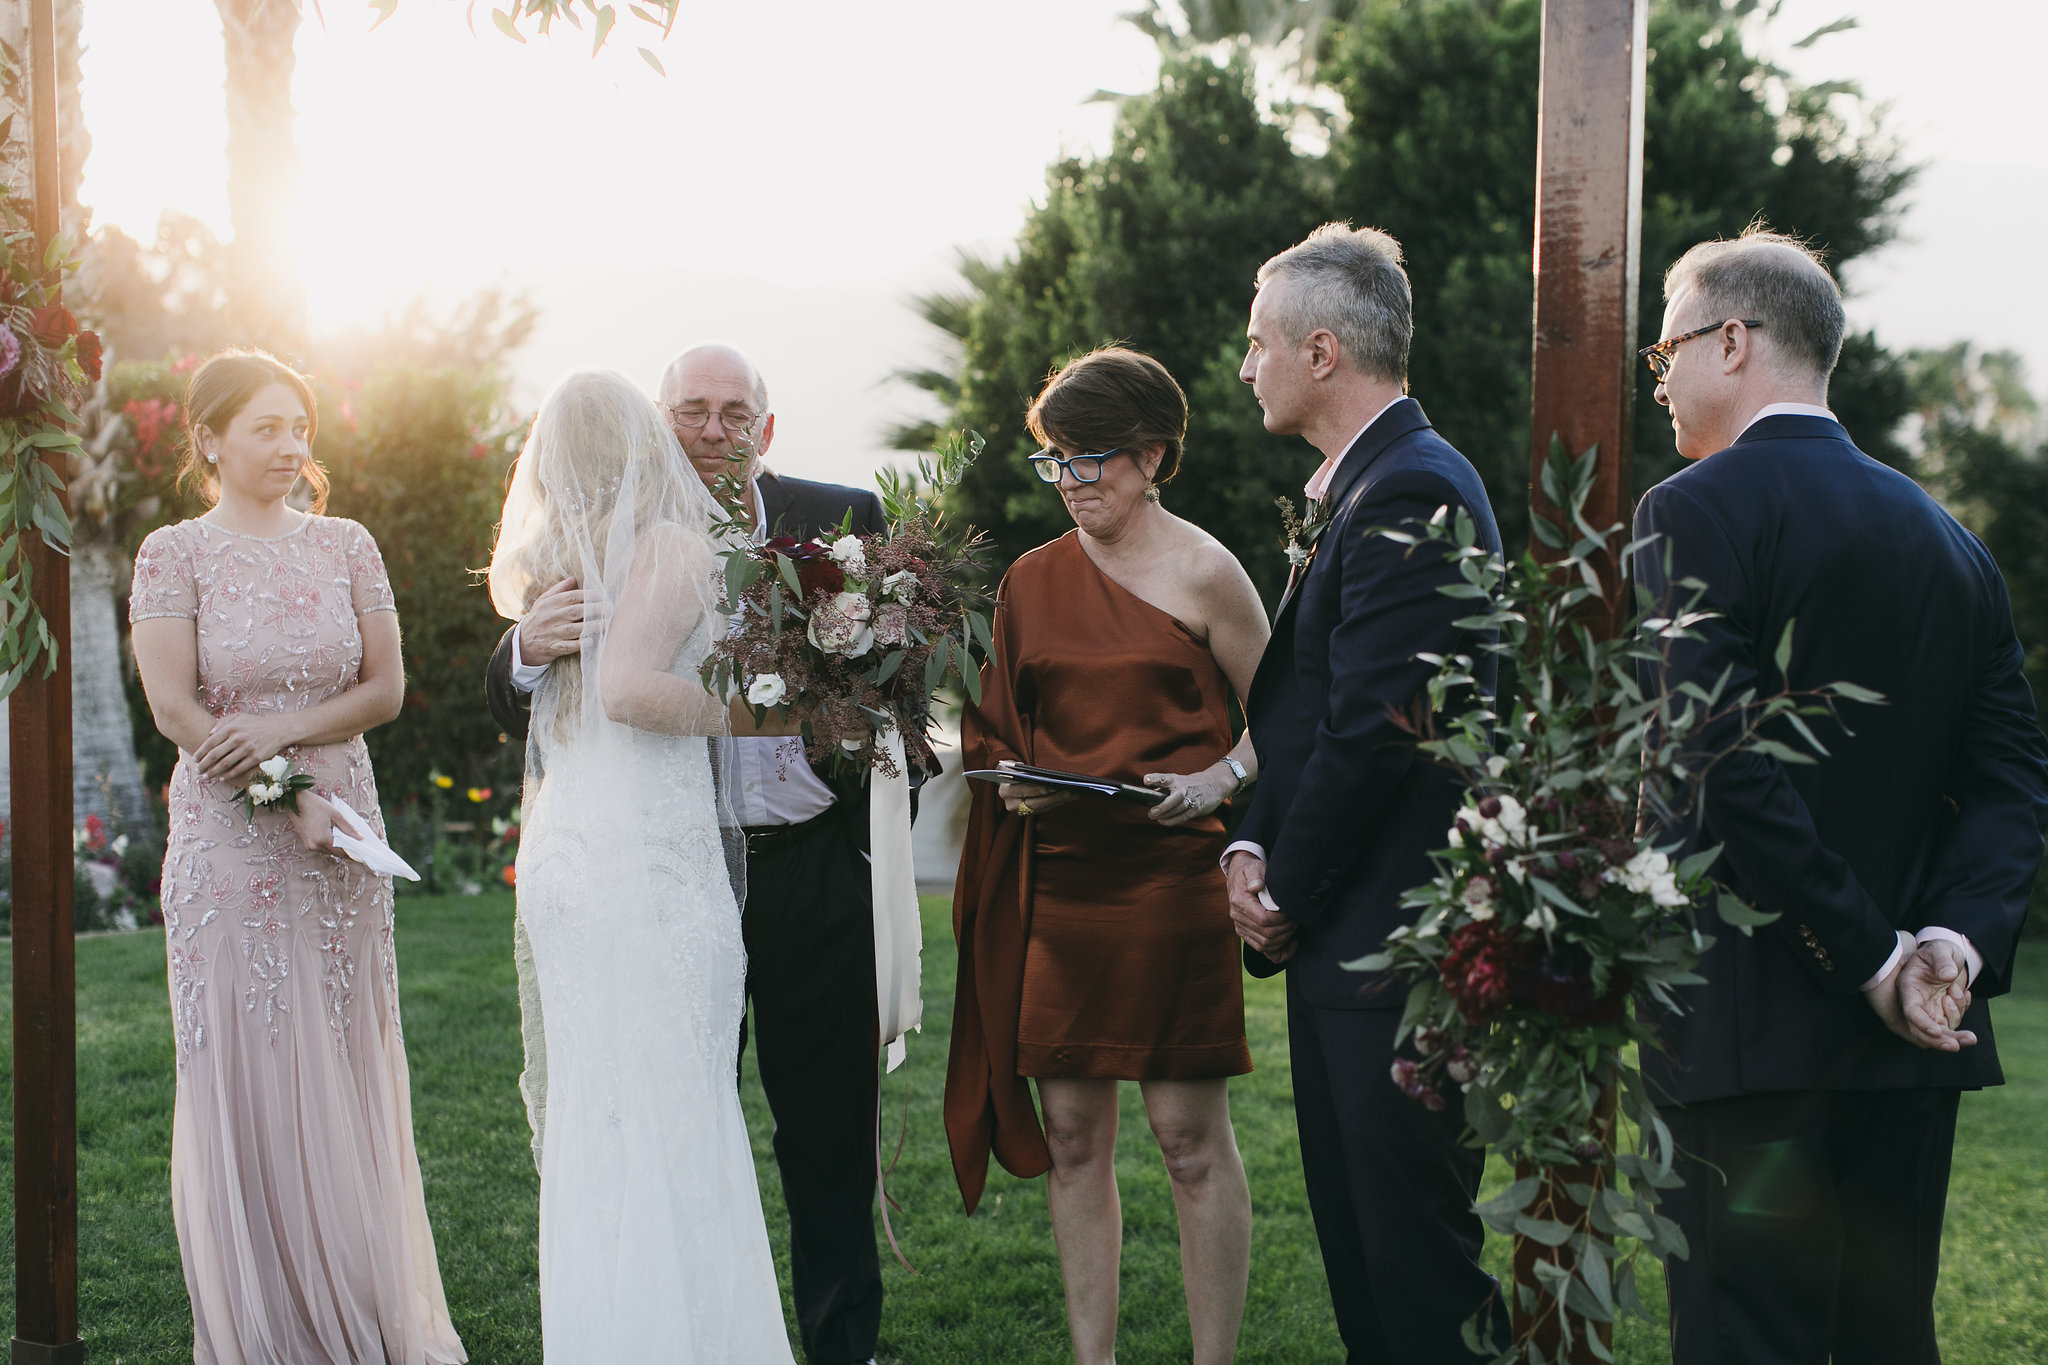 Gracy-Andrew-Wedding-444.jpg